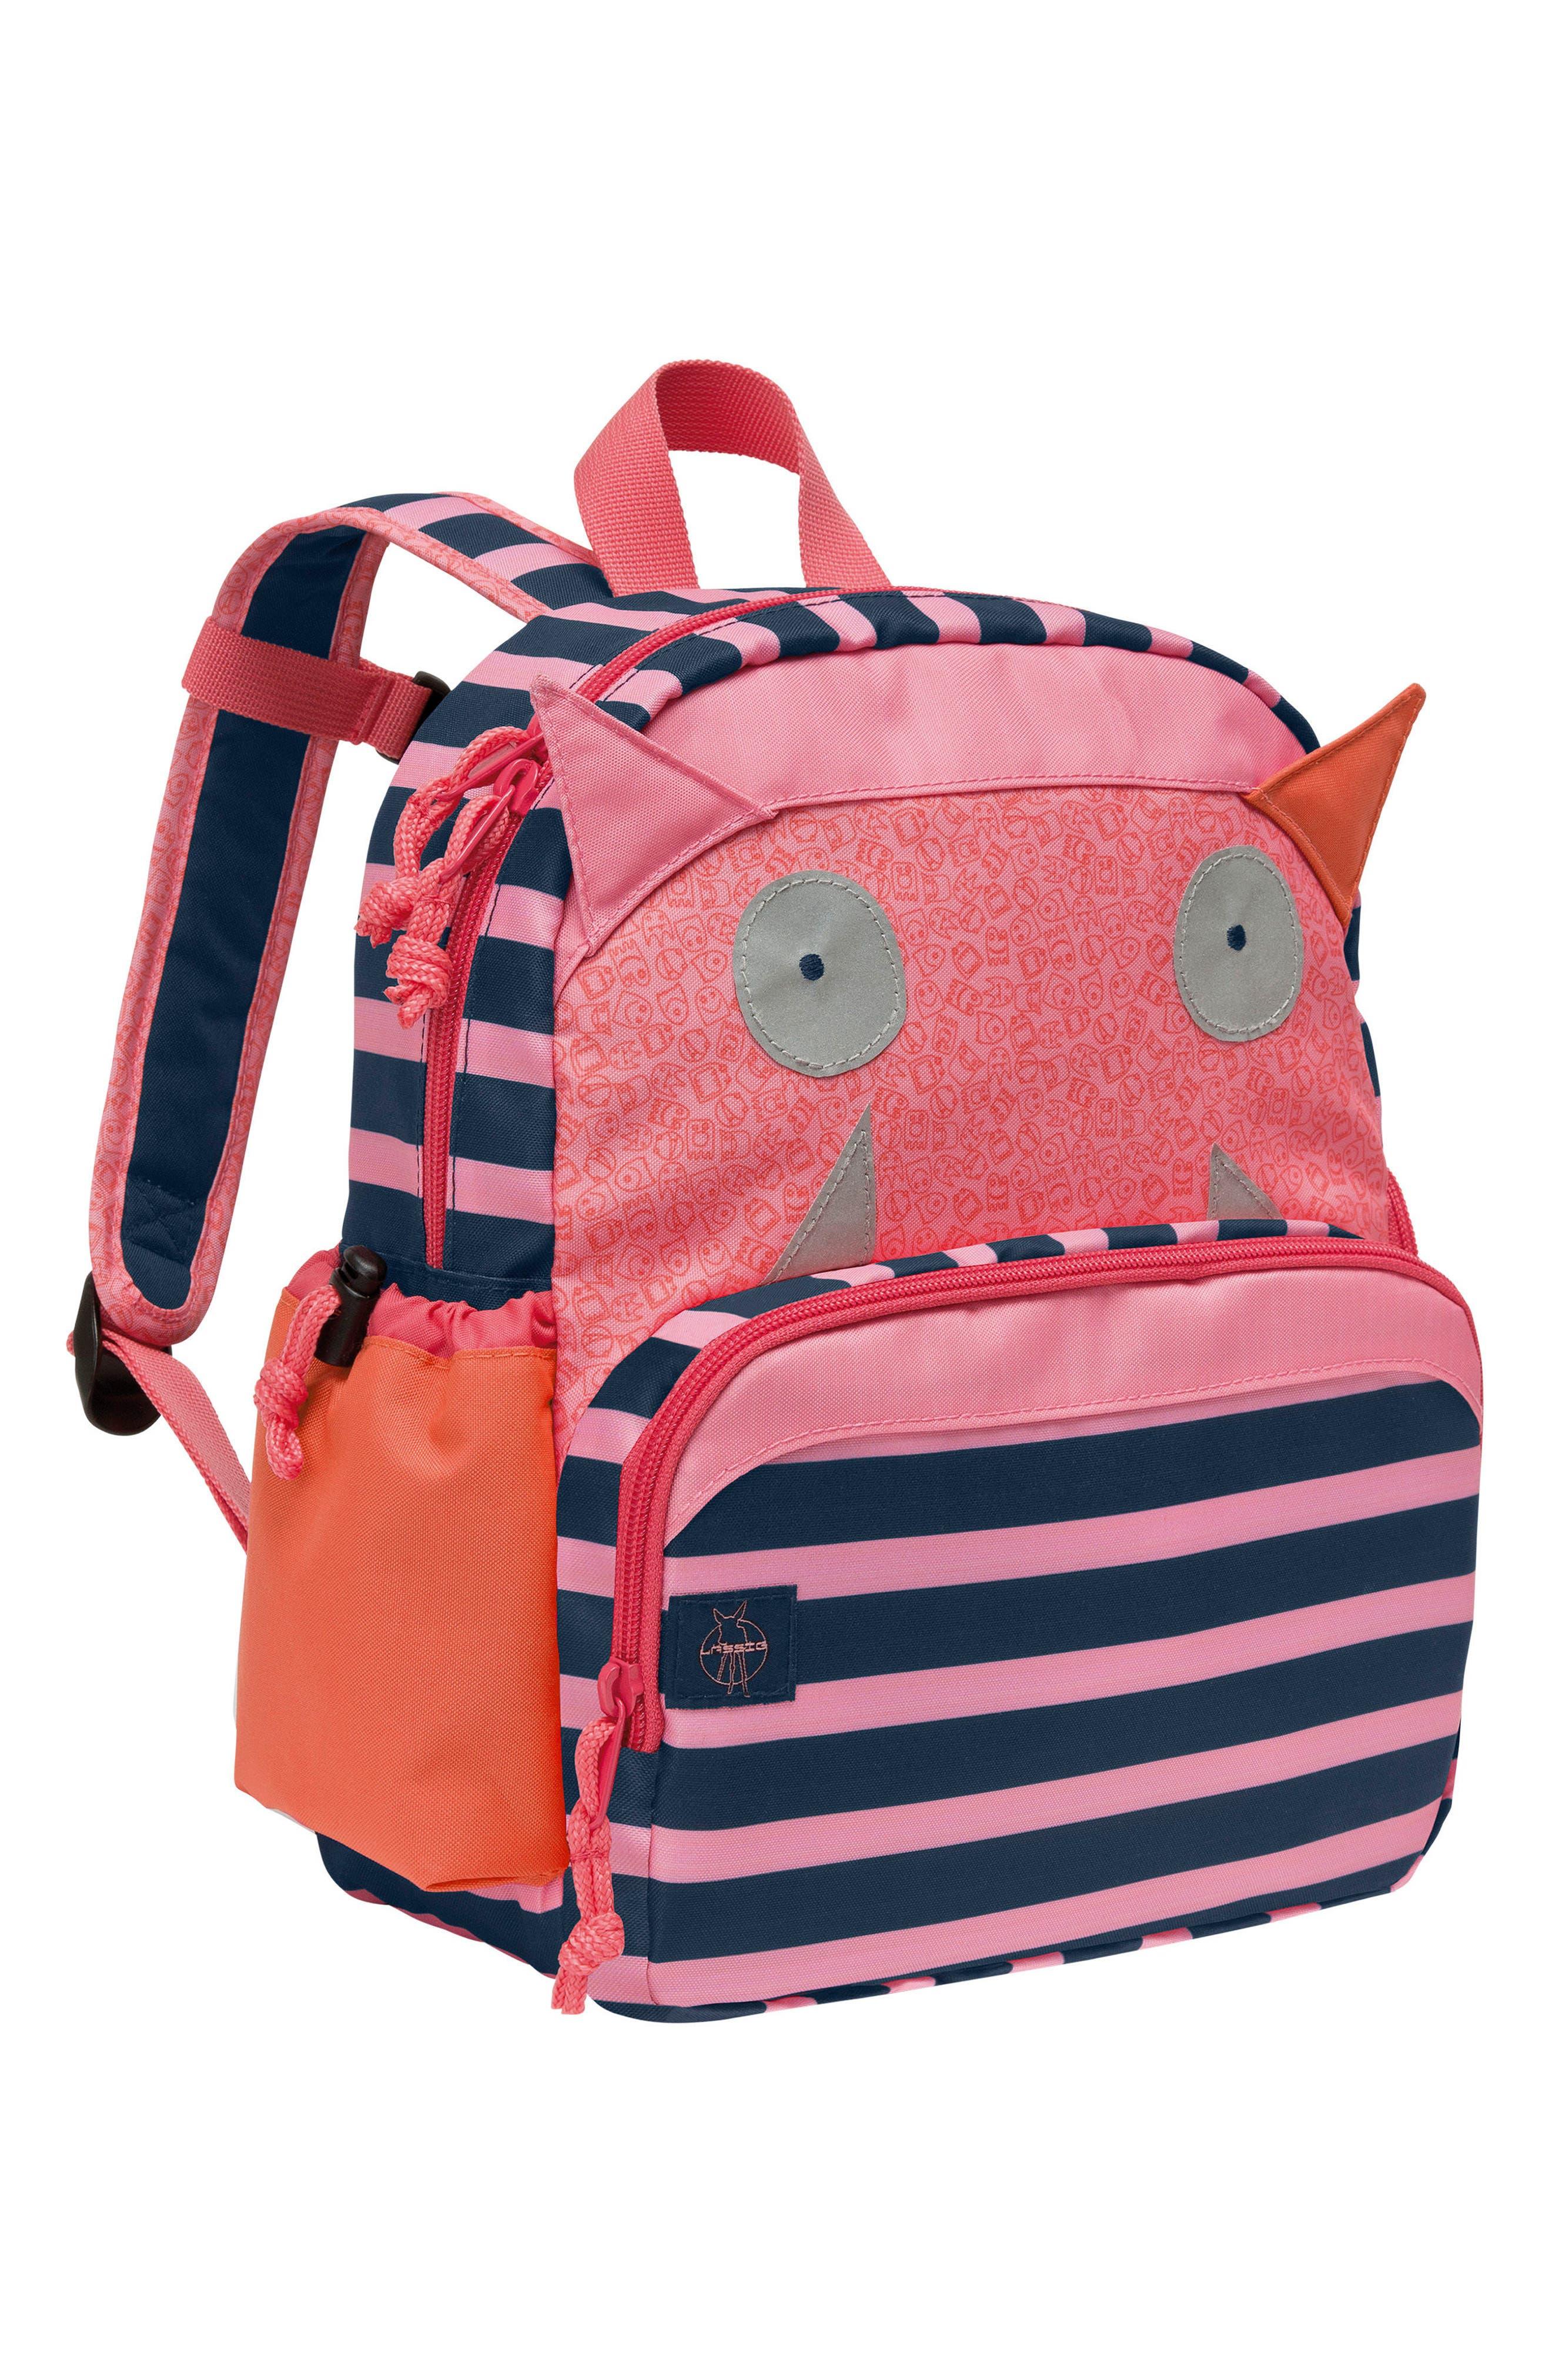 LÄSSIG Little Monster Glow in the Dark Mini Backpack